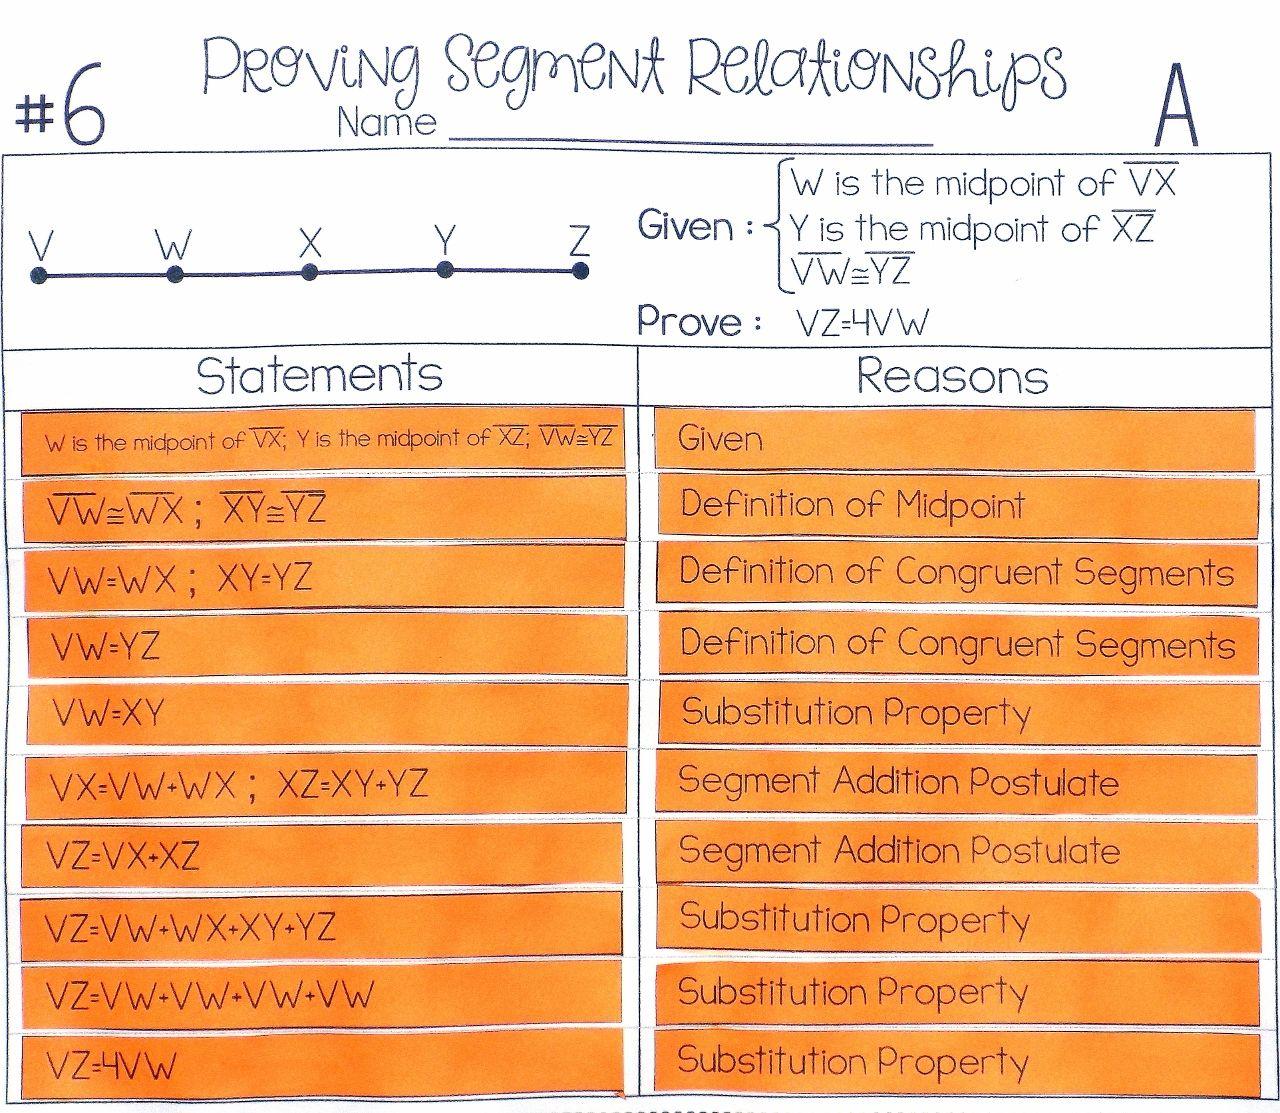 Segment Relationships Proof Activity